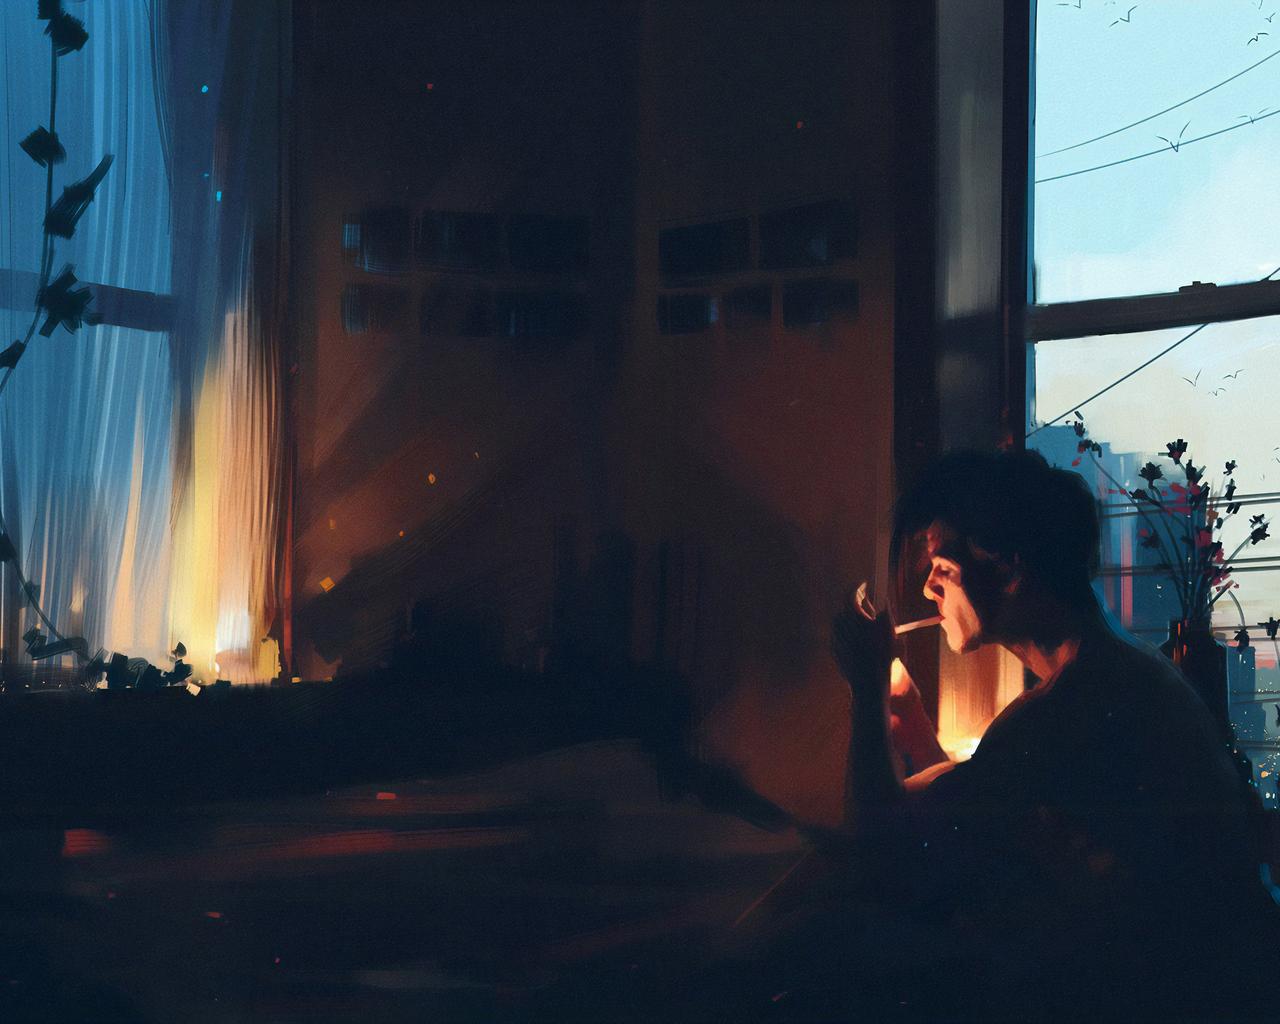 boy-alone-in-room-smoking-4k-0z.jpg